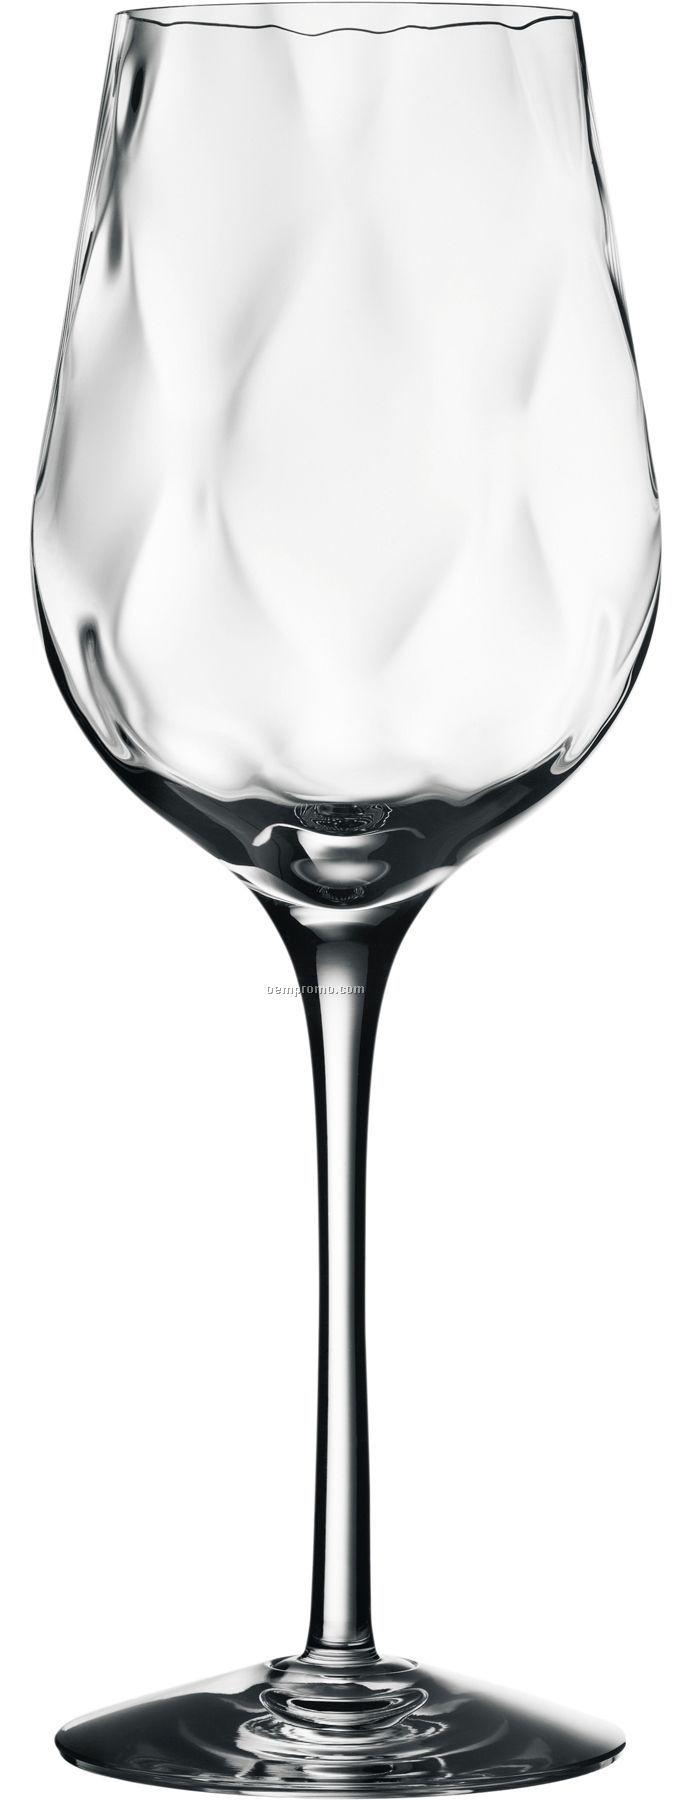 Dizzy Diamond Crystal White Wine Stemware By Malin Lindahl